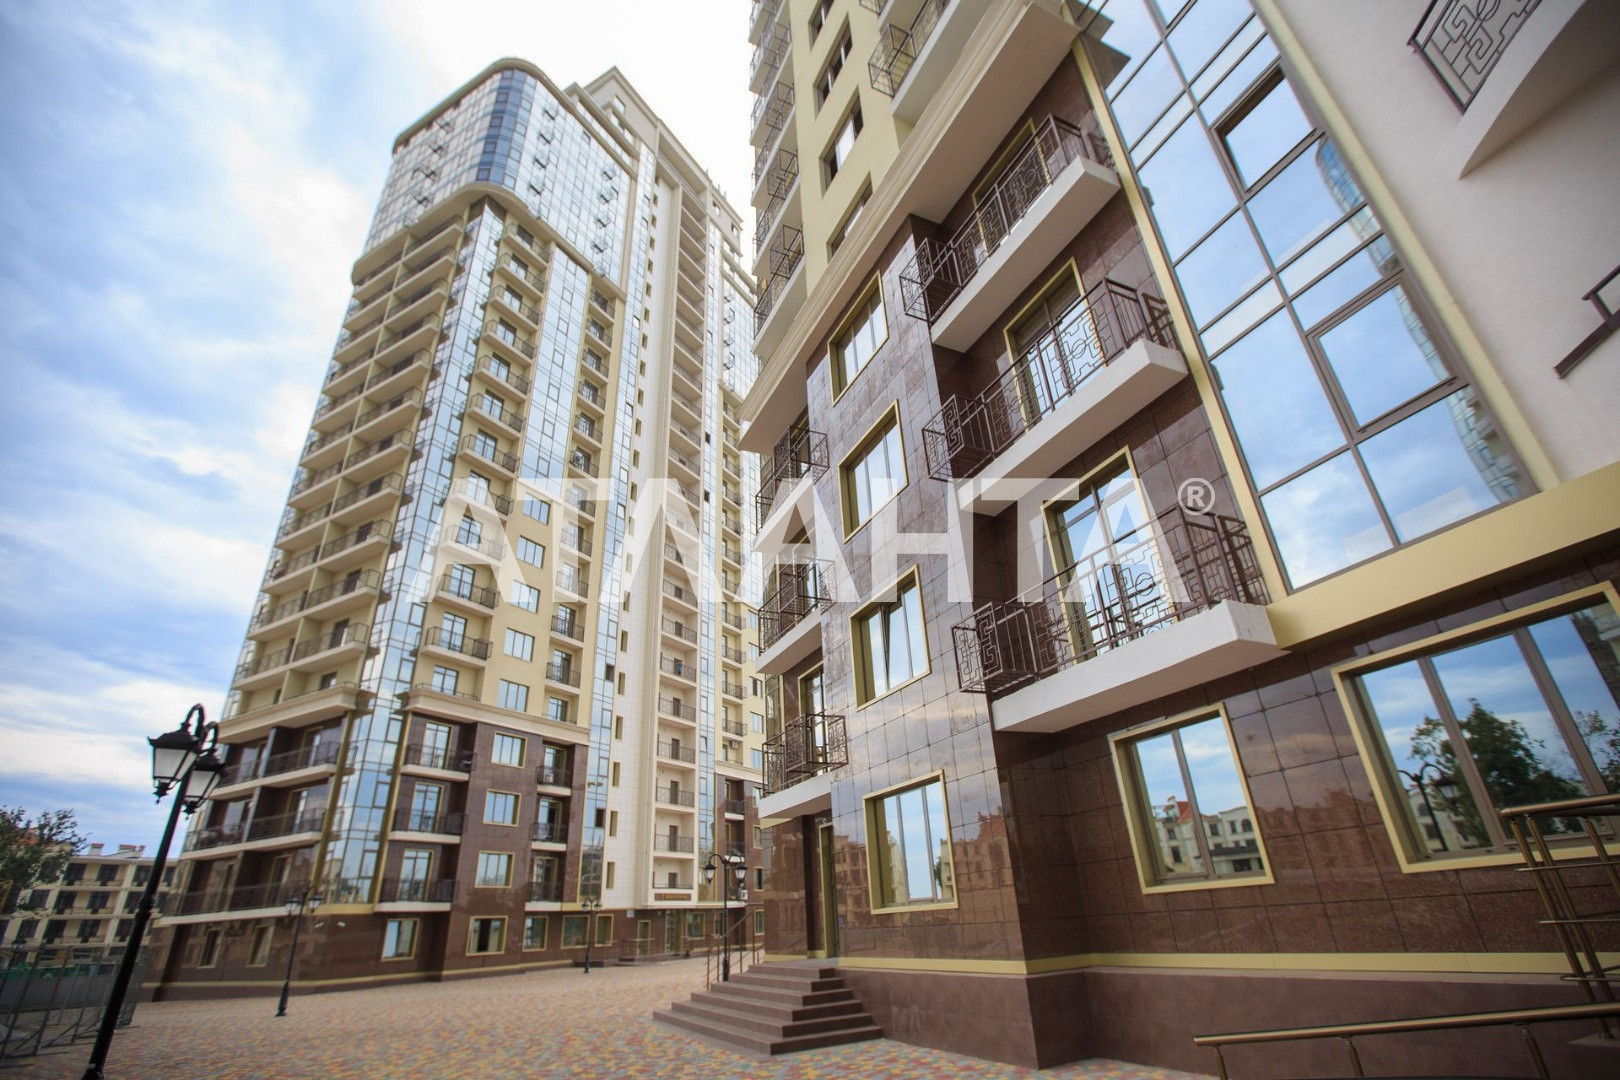 Продается 1-комнатная Квартира на ул. Французский Бул. (Пролетарский Бул.) — 52 000 у.е. (фото №10)